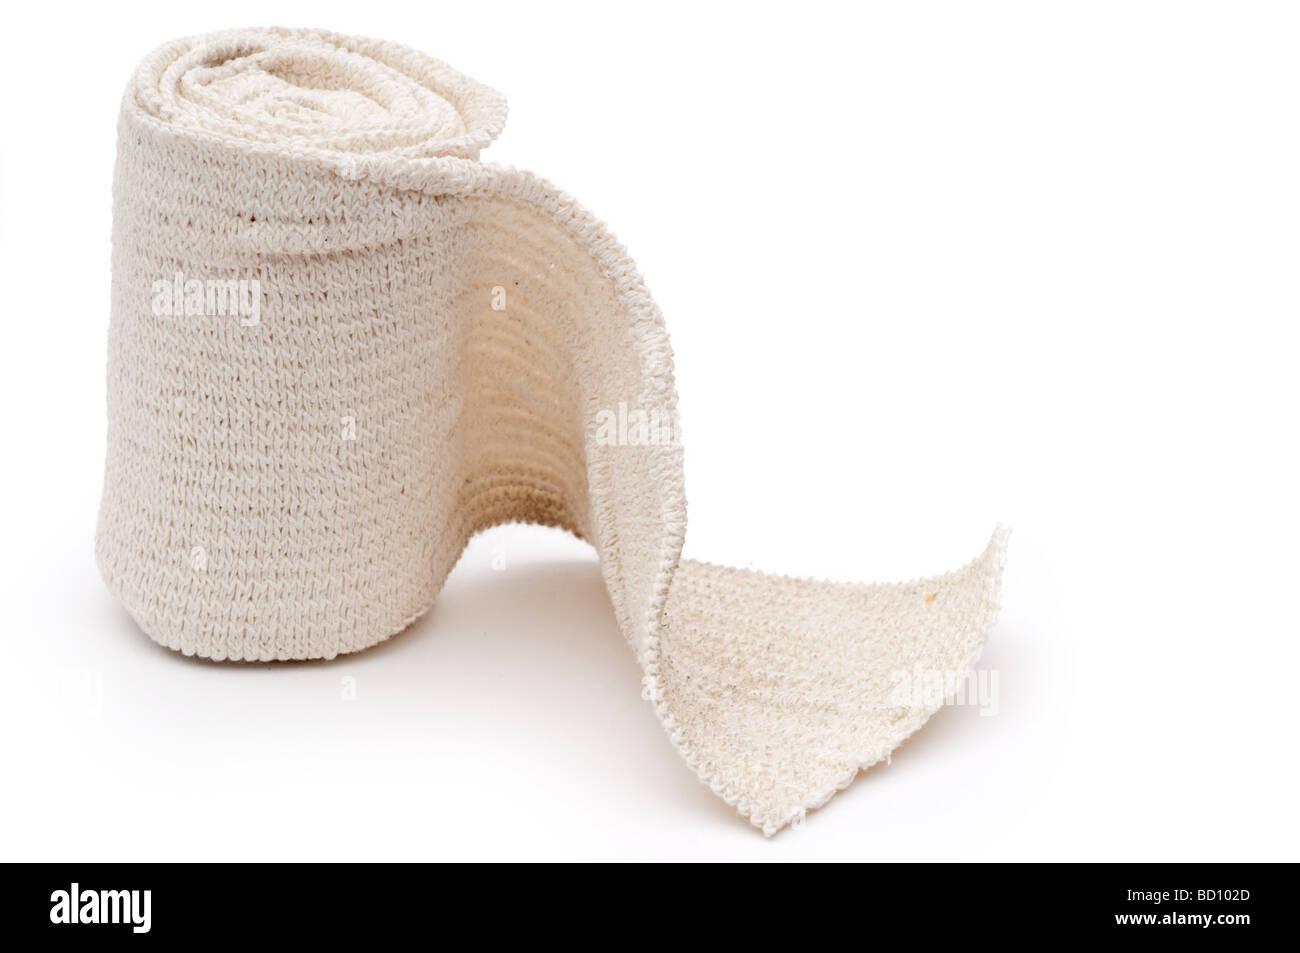 Horizontal image of a roll of medical bandage - Stock Image